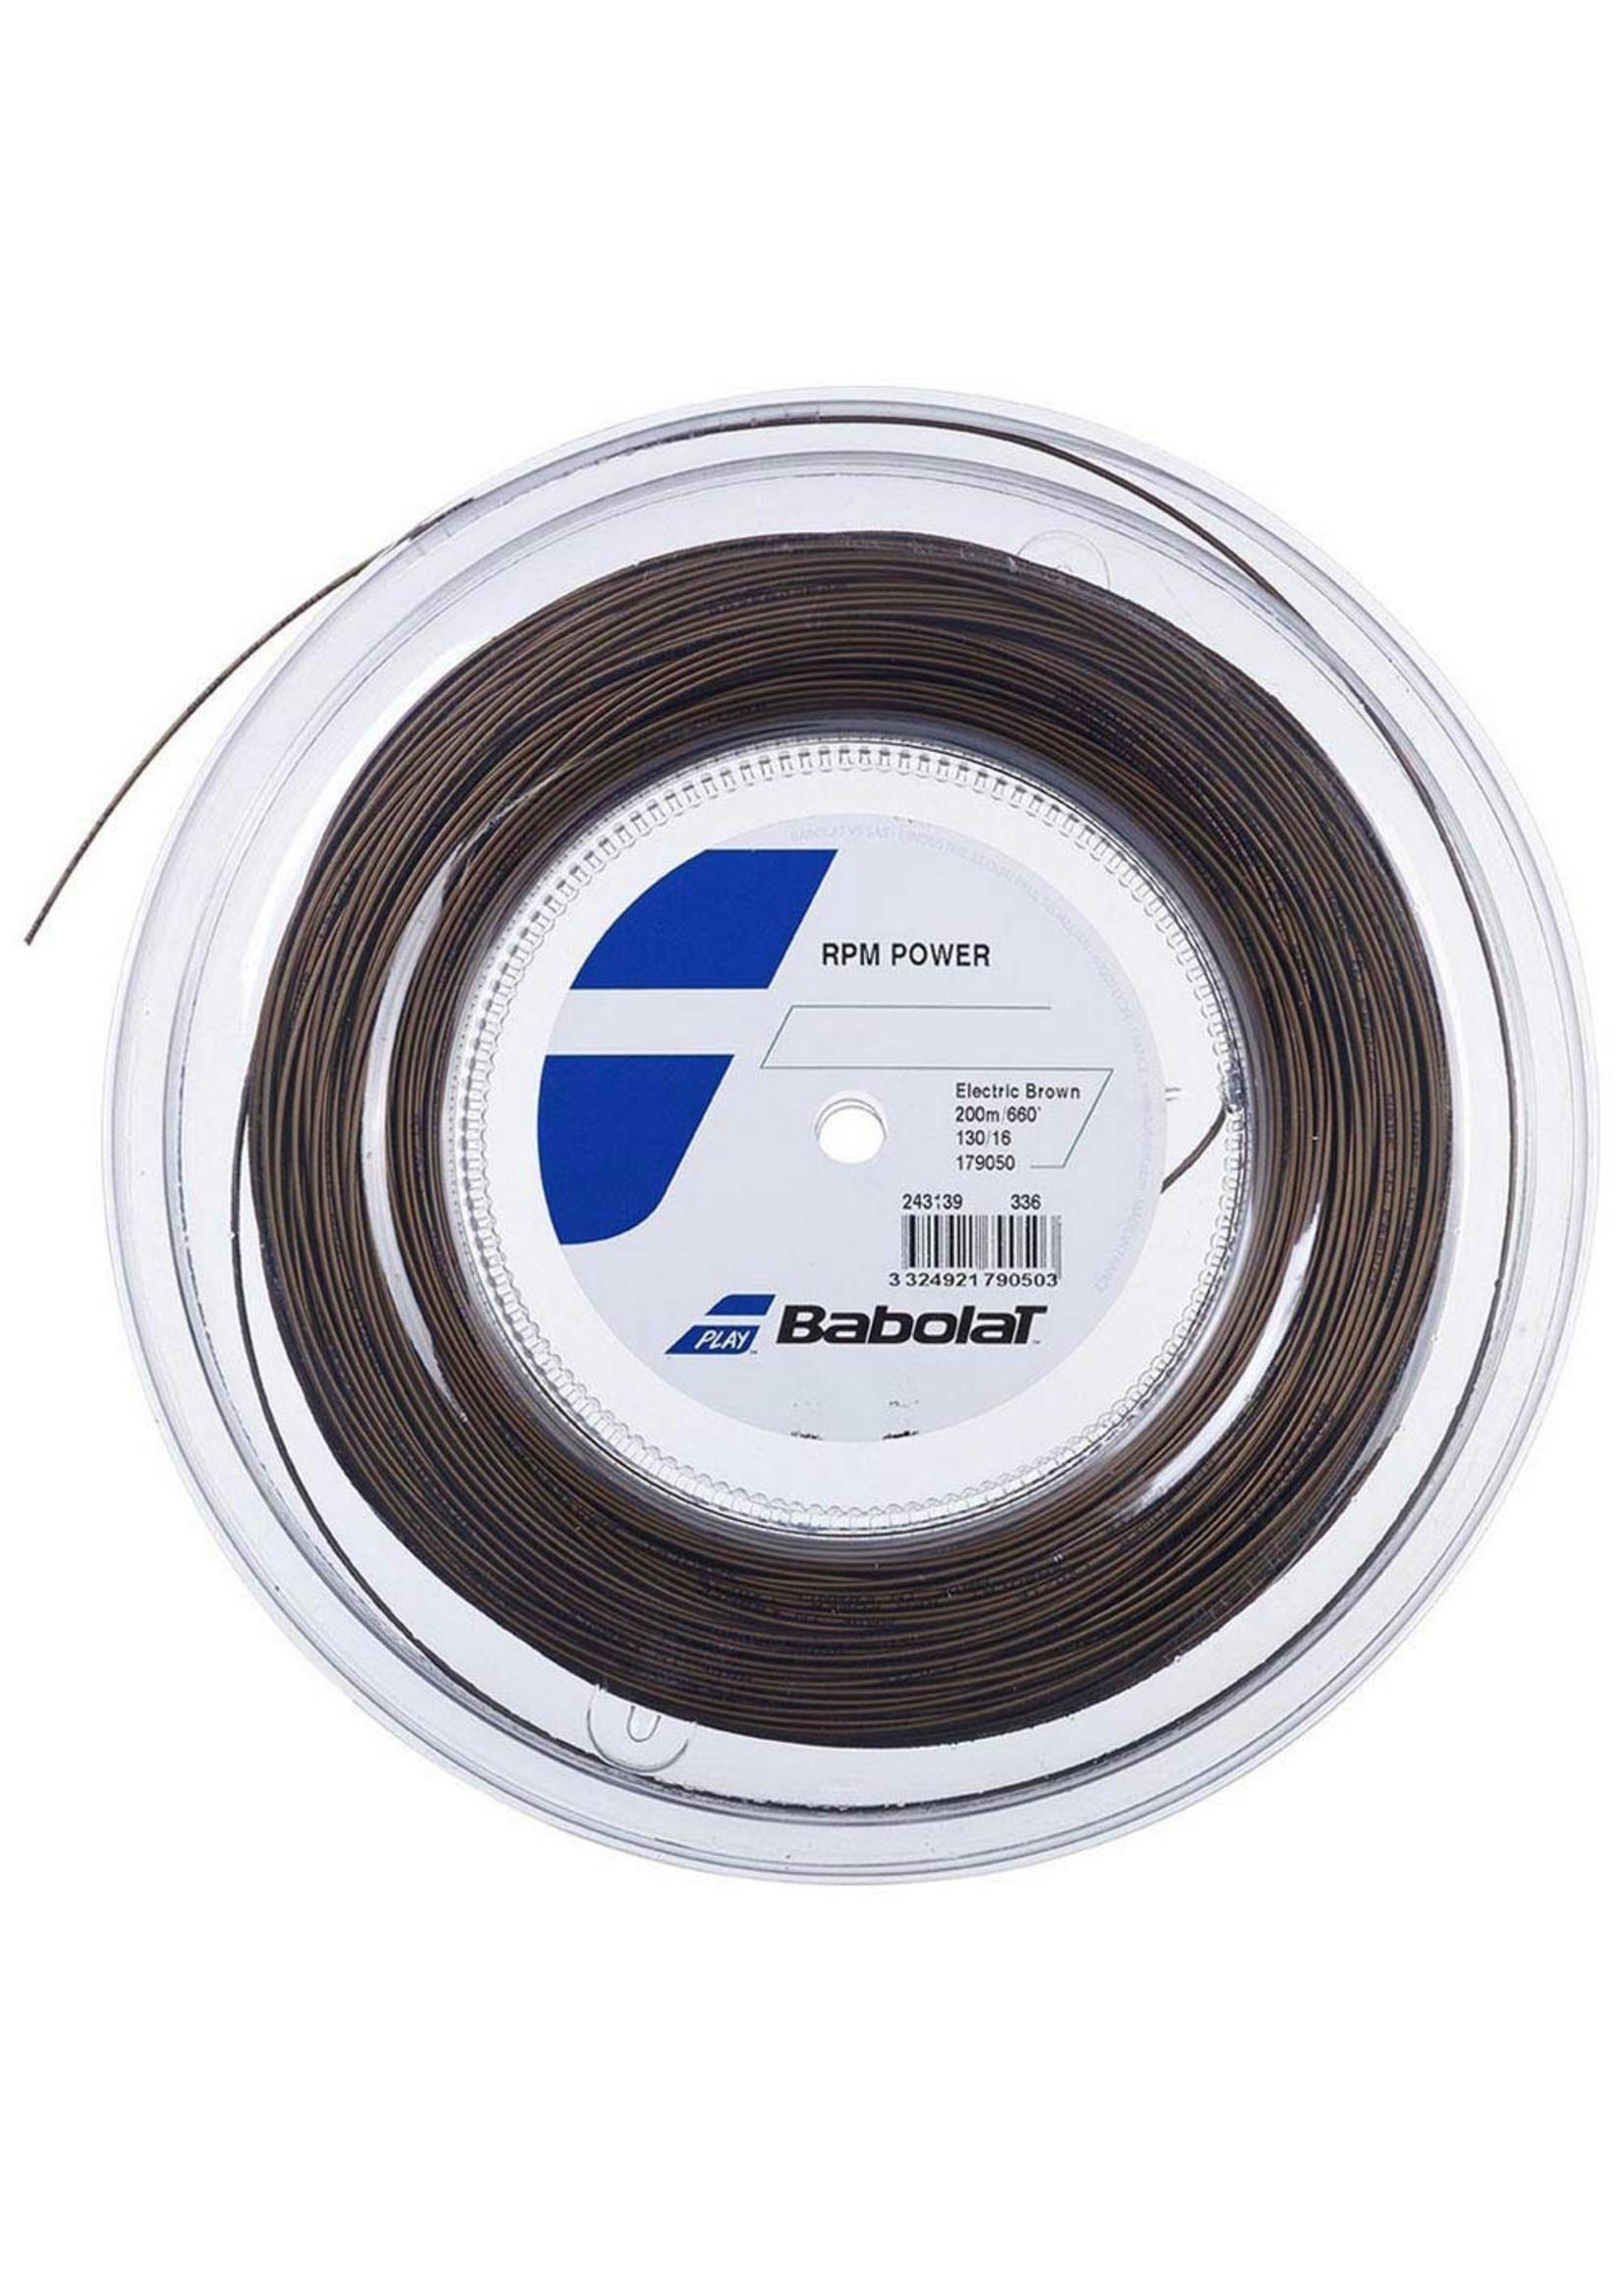 Babolat Babolat RPM Power Restring